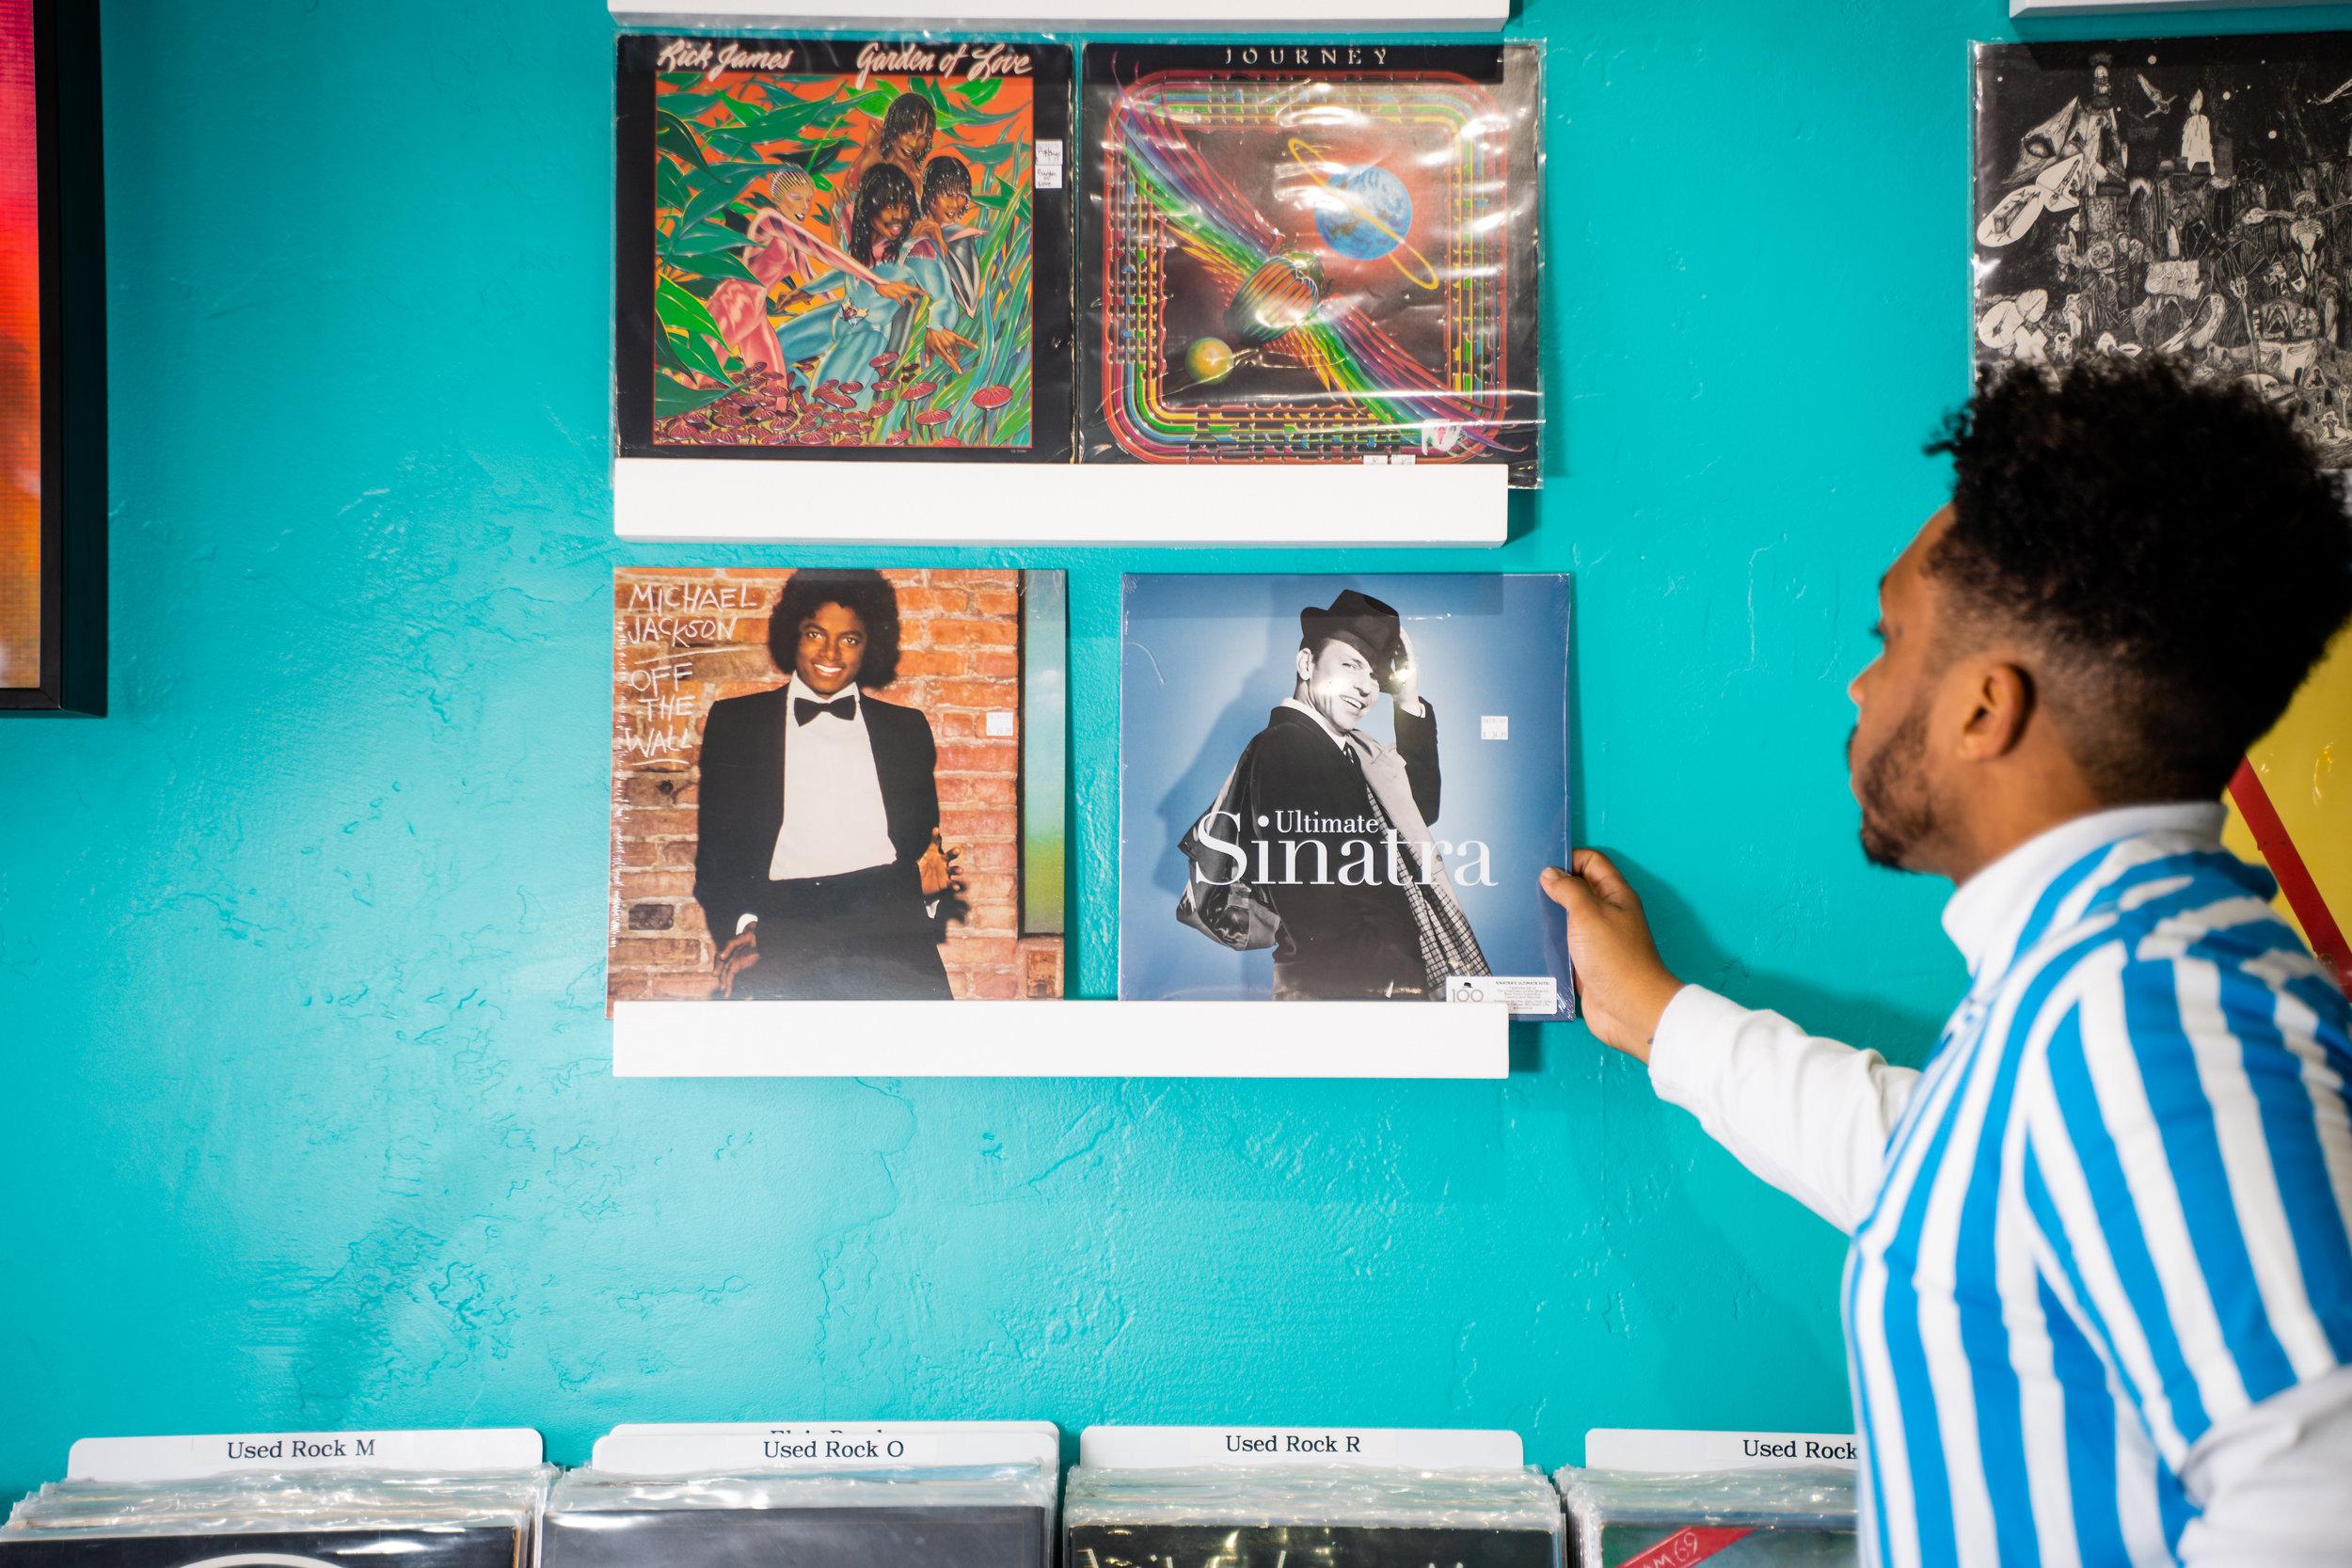 Dean Hall - Feb Record Store Shoot-9.JPG